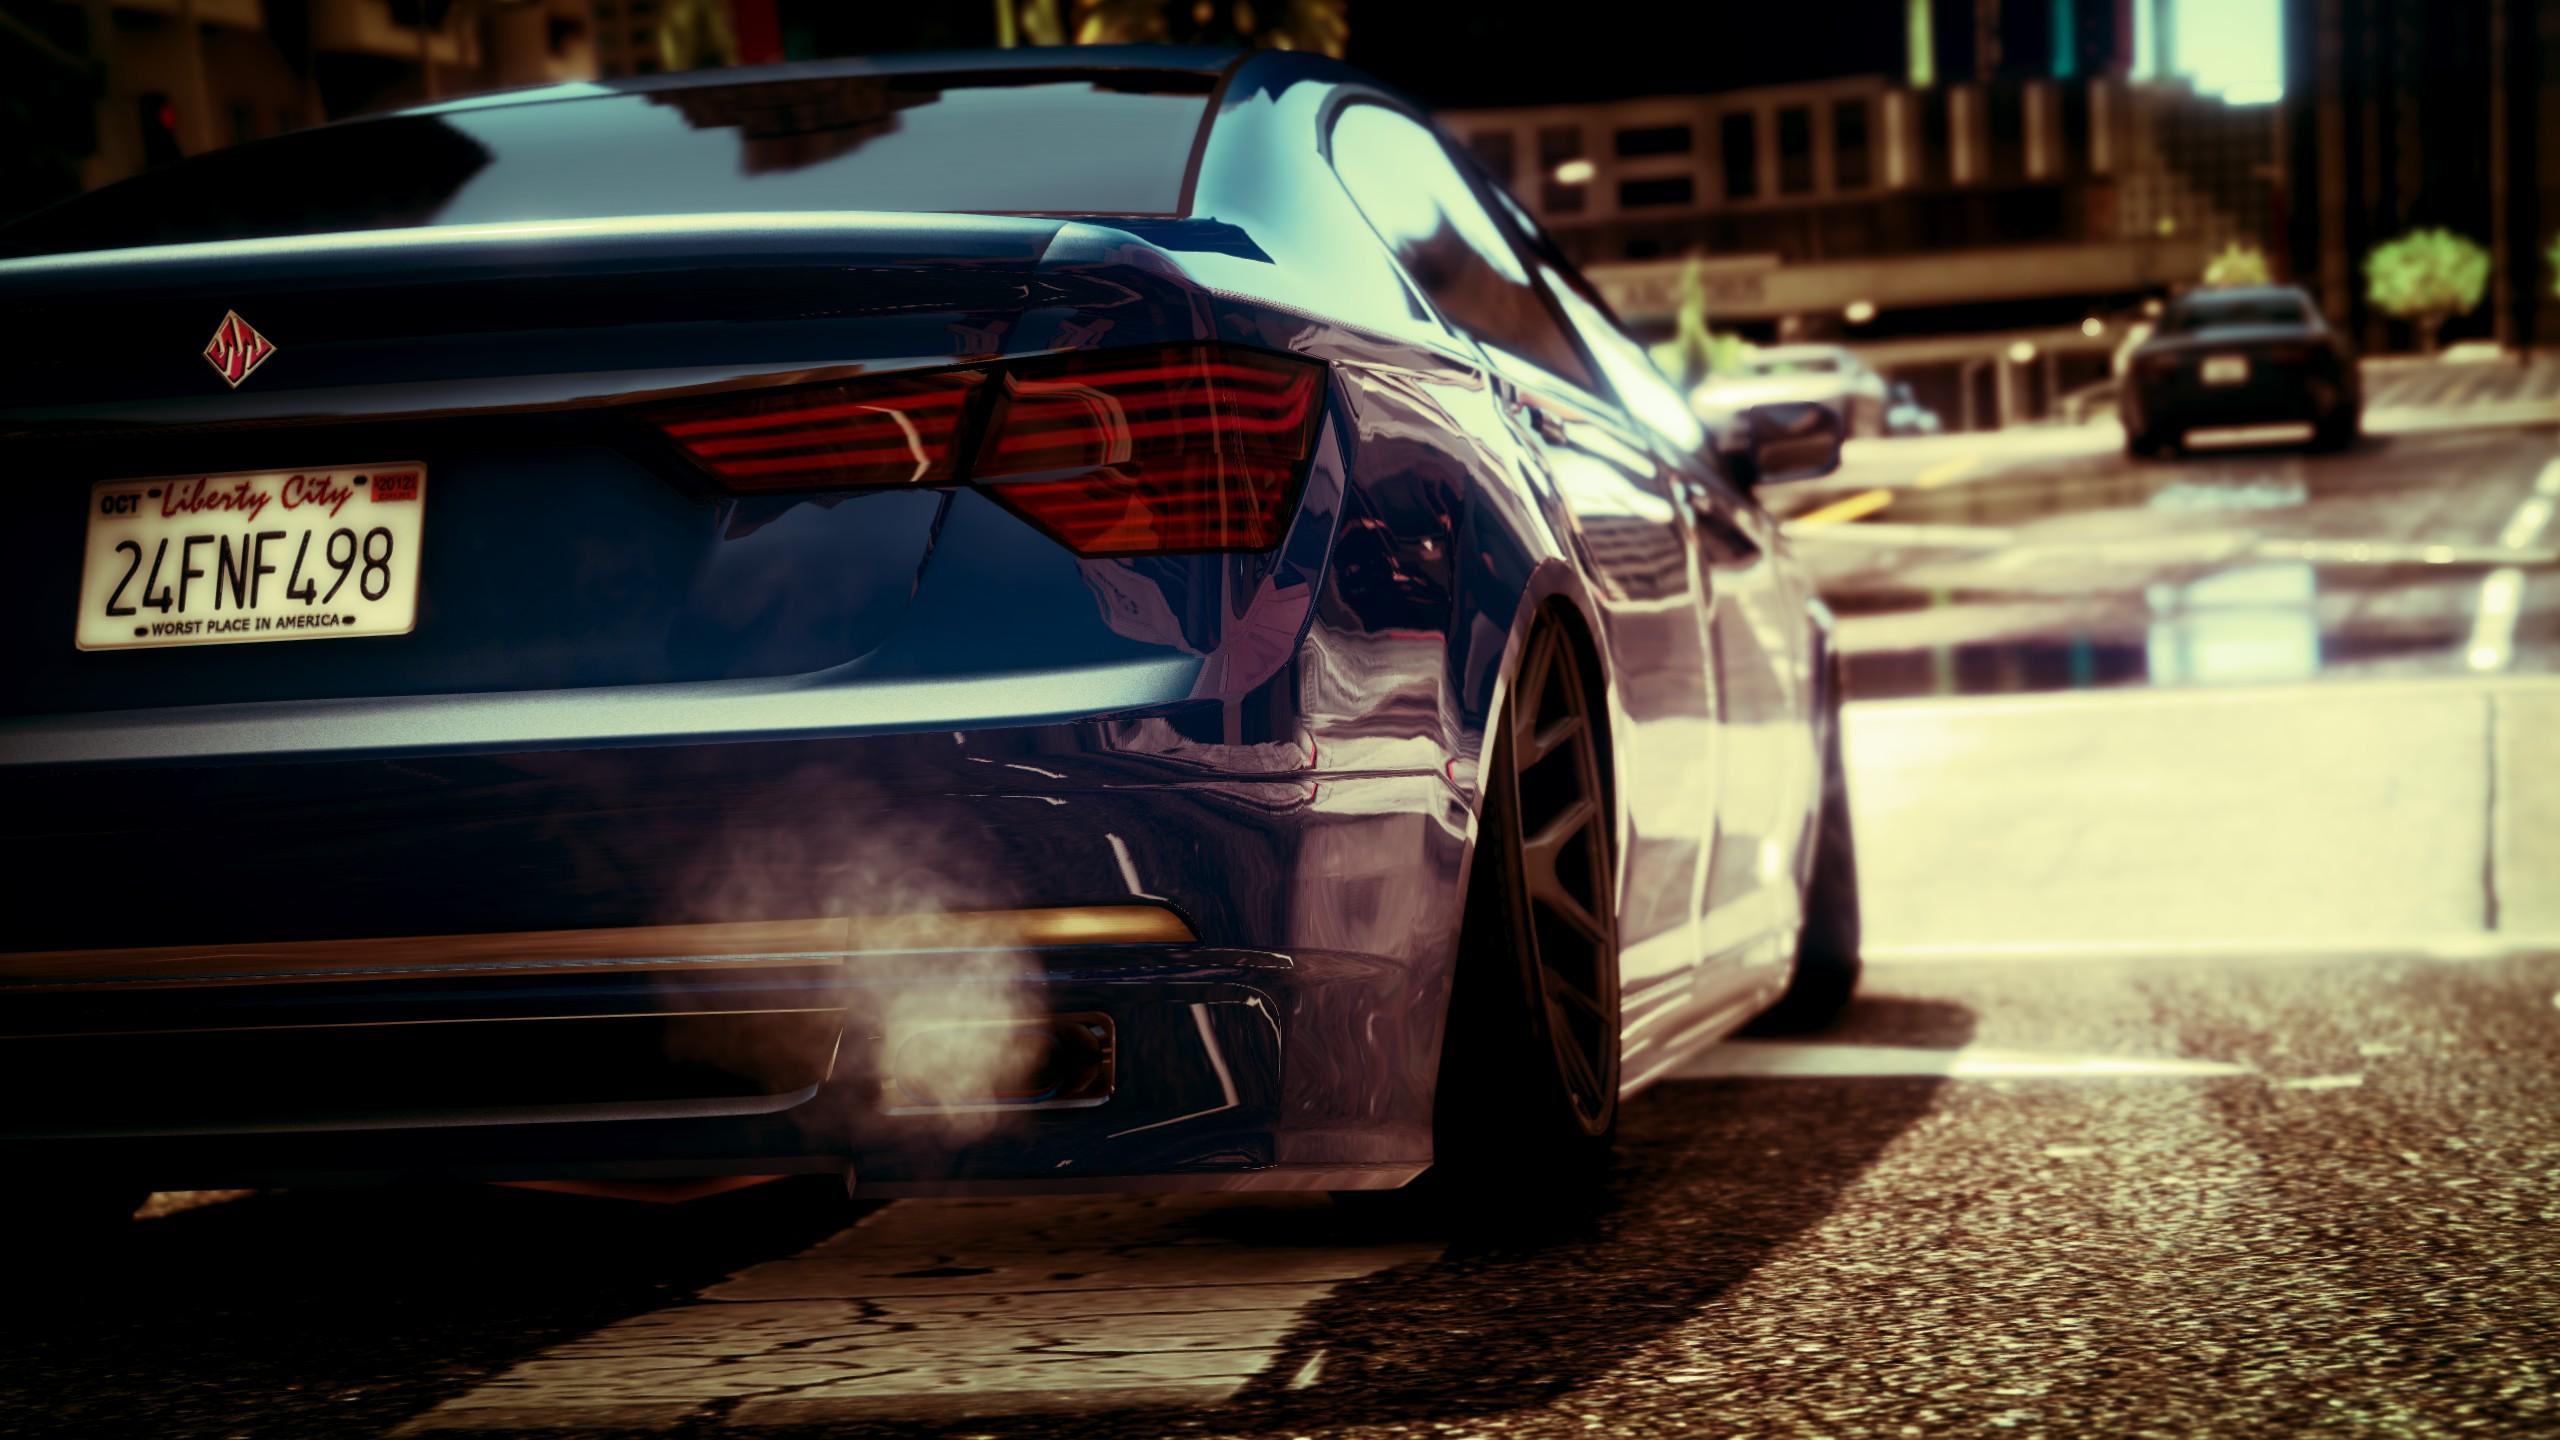 Grand Theft Auto V Fond d'écran HD | Arrière-Plan | 2560x1440 | ID:849420 - Wallpaper Abyss